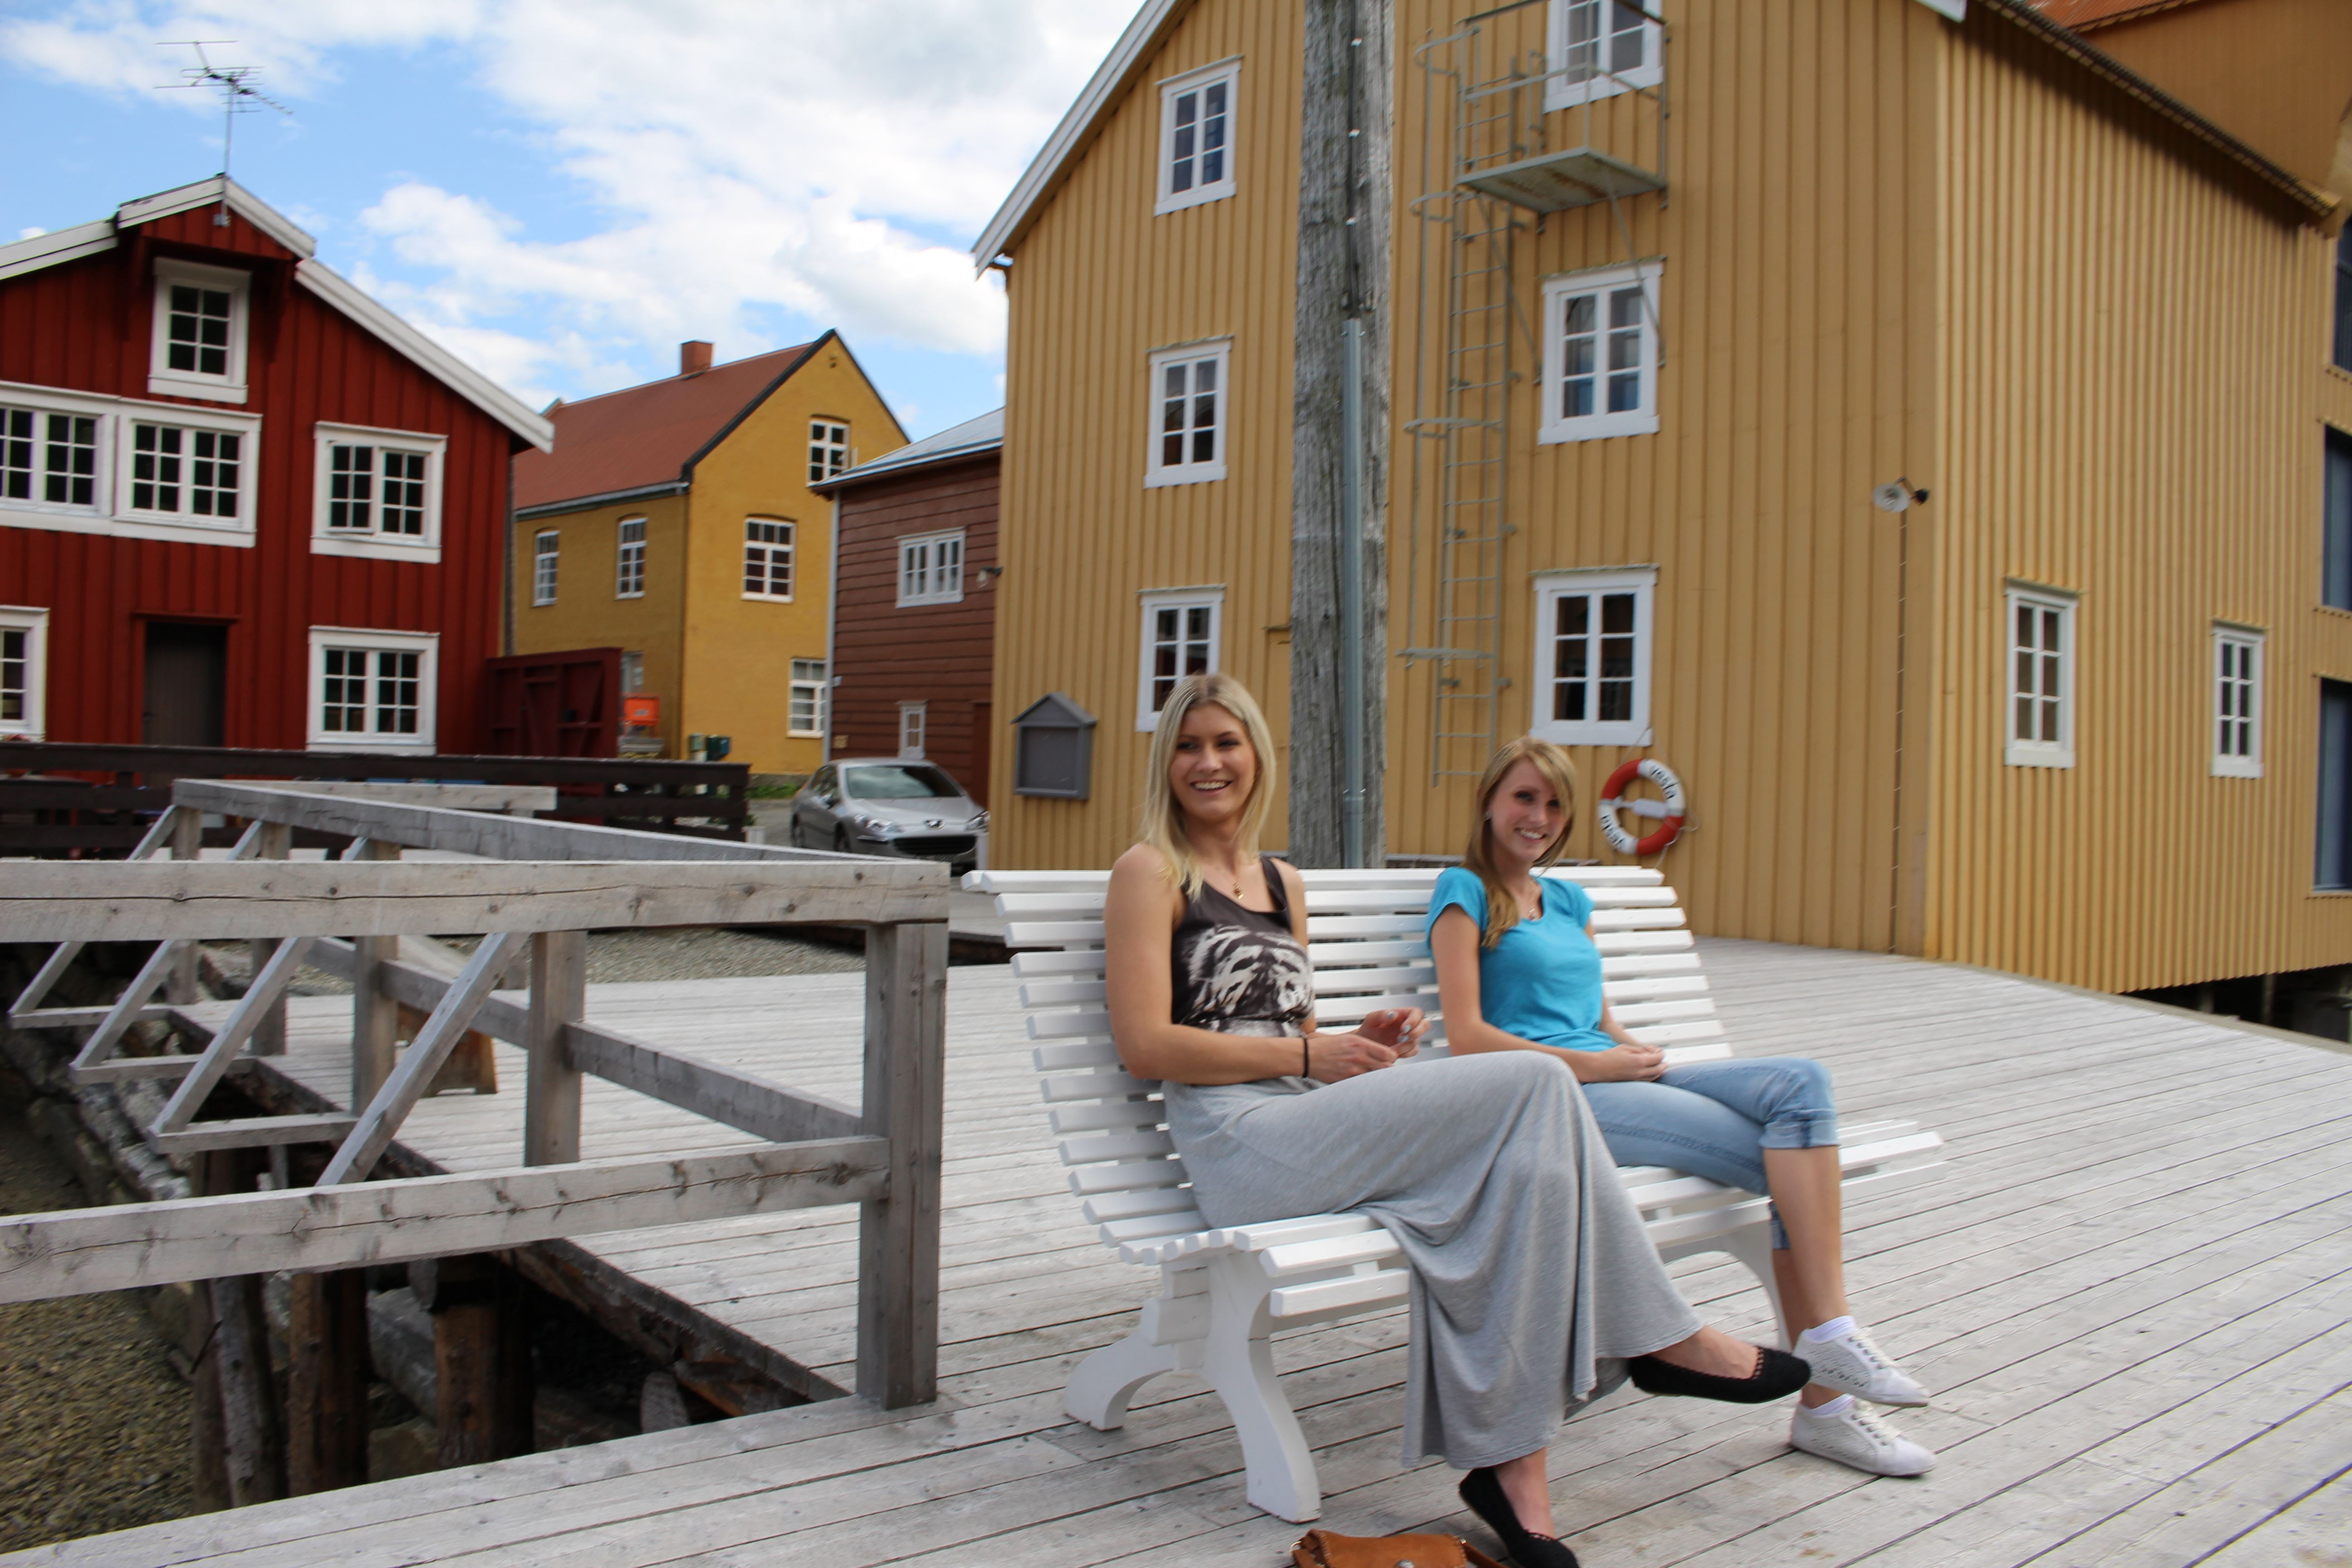 Sjøgata Street in Mosjøen